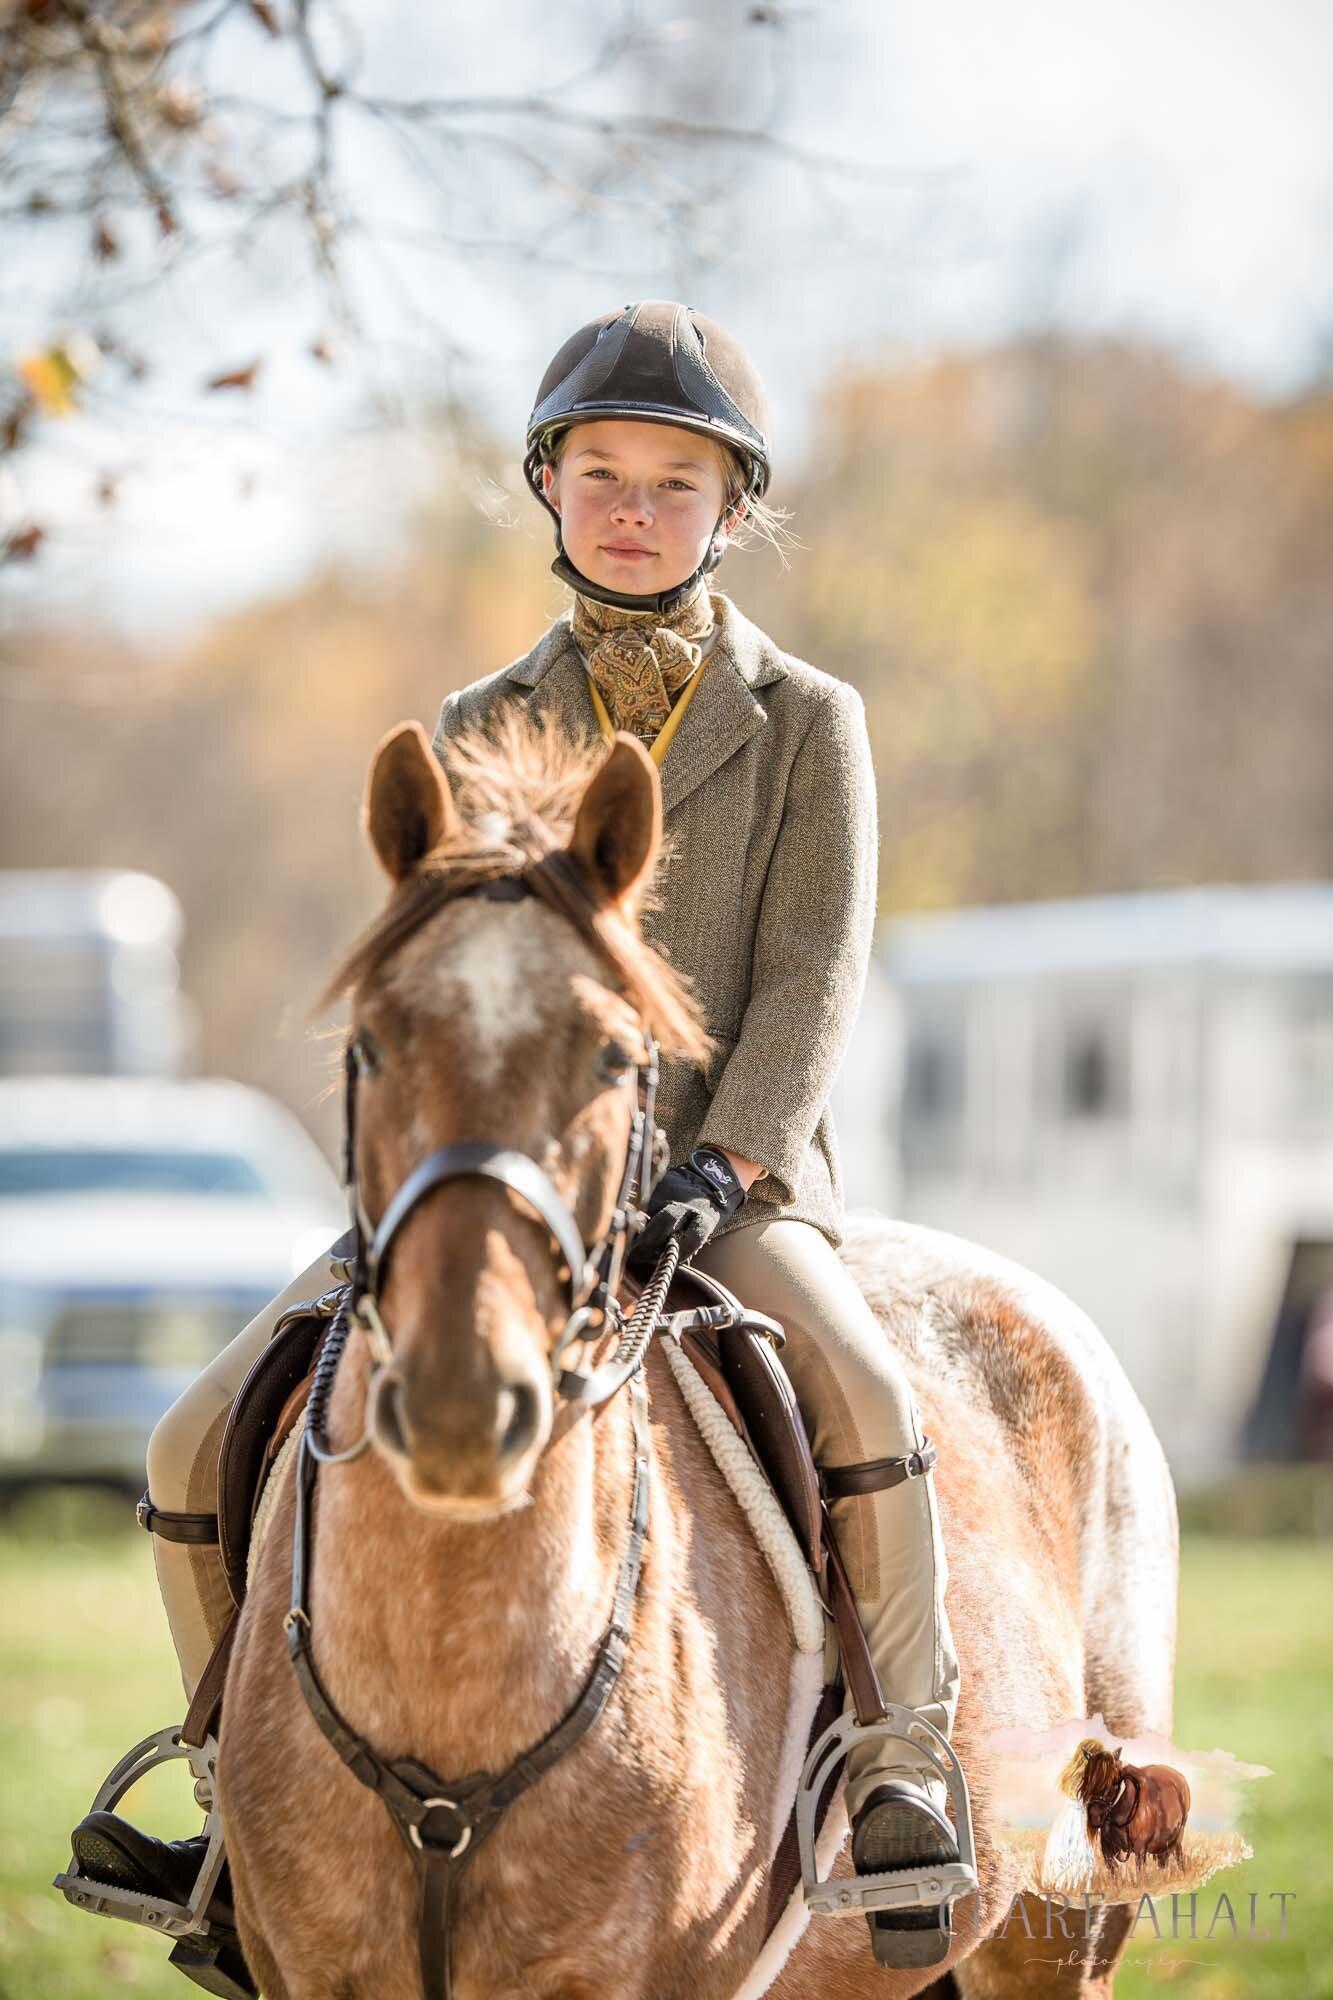 equine_photographer_potomac_md_equine_photographer_middleburg_VA_equine_portraiture_loudon_county_VA-2909.jpg